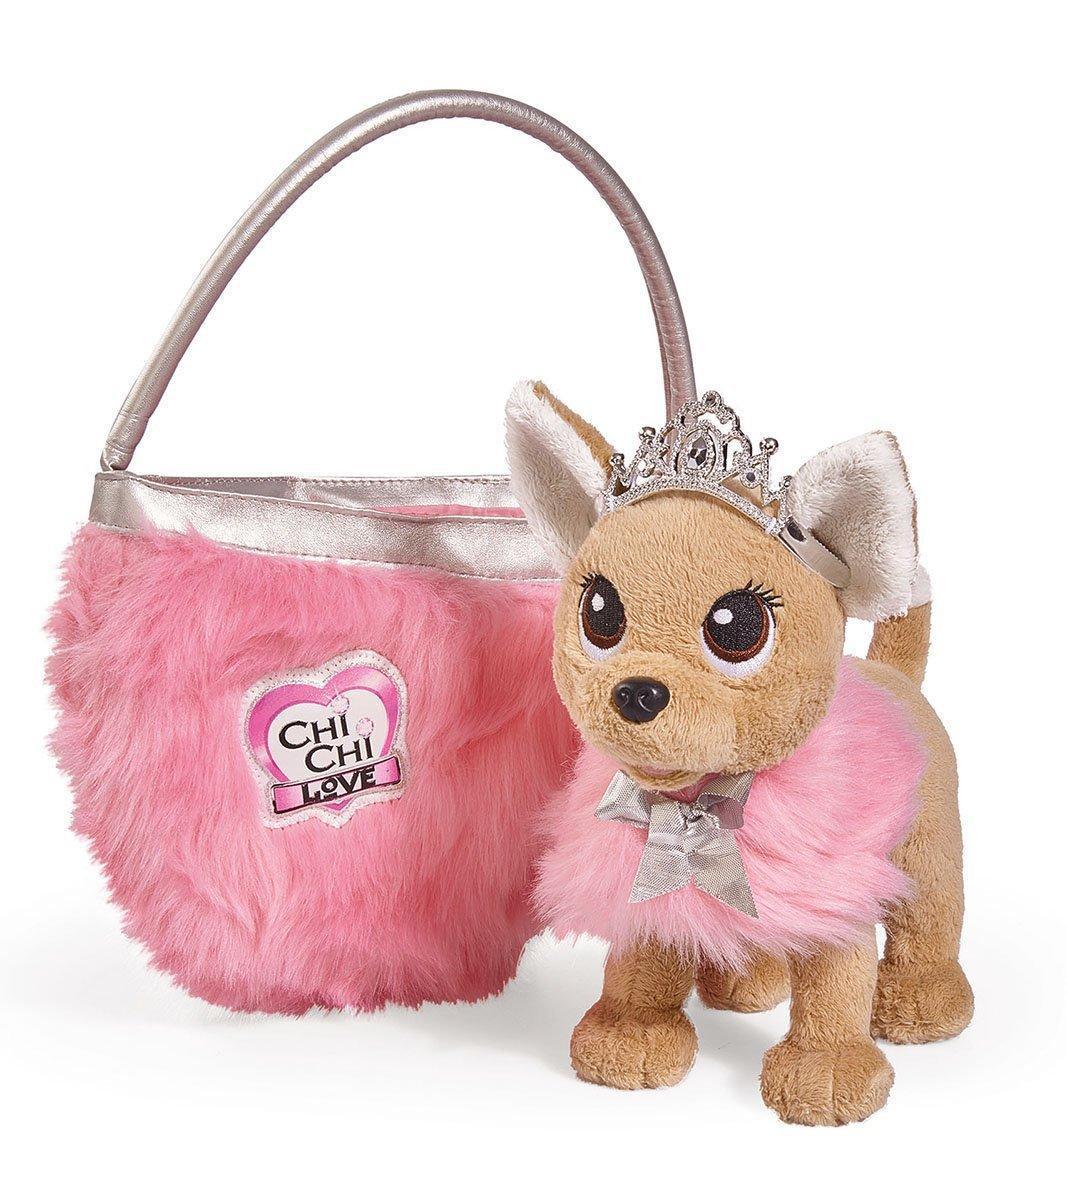 Плюшевая собачка Chi-Chi love Simba 5893126